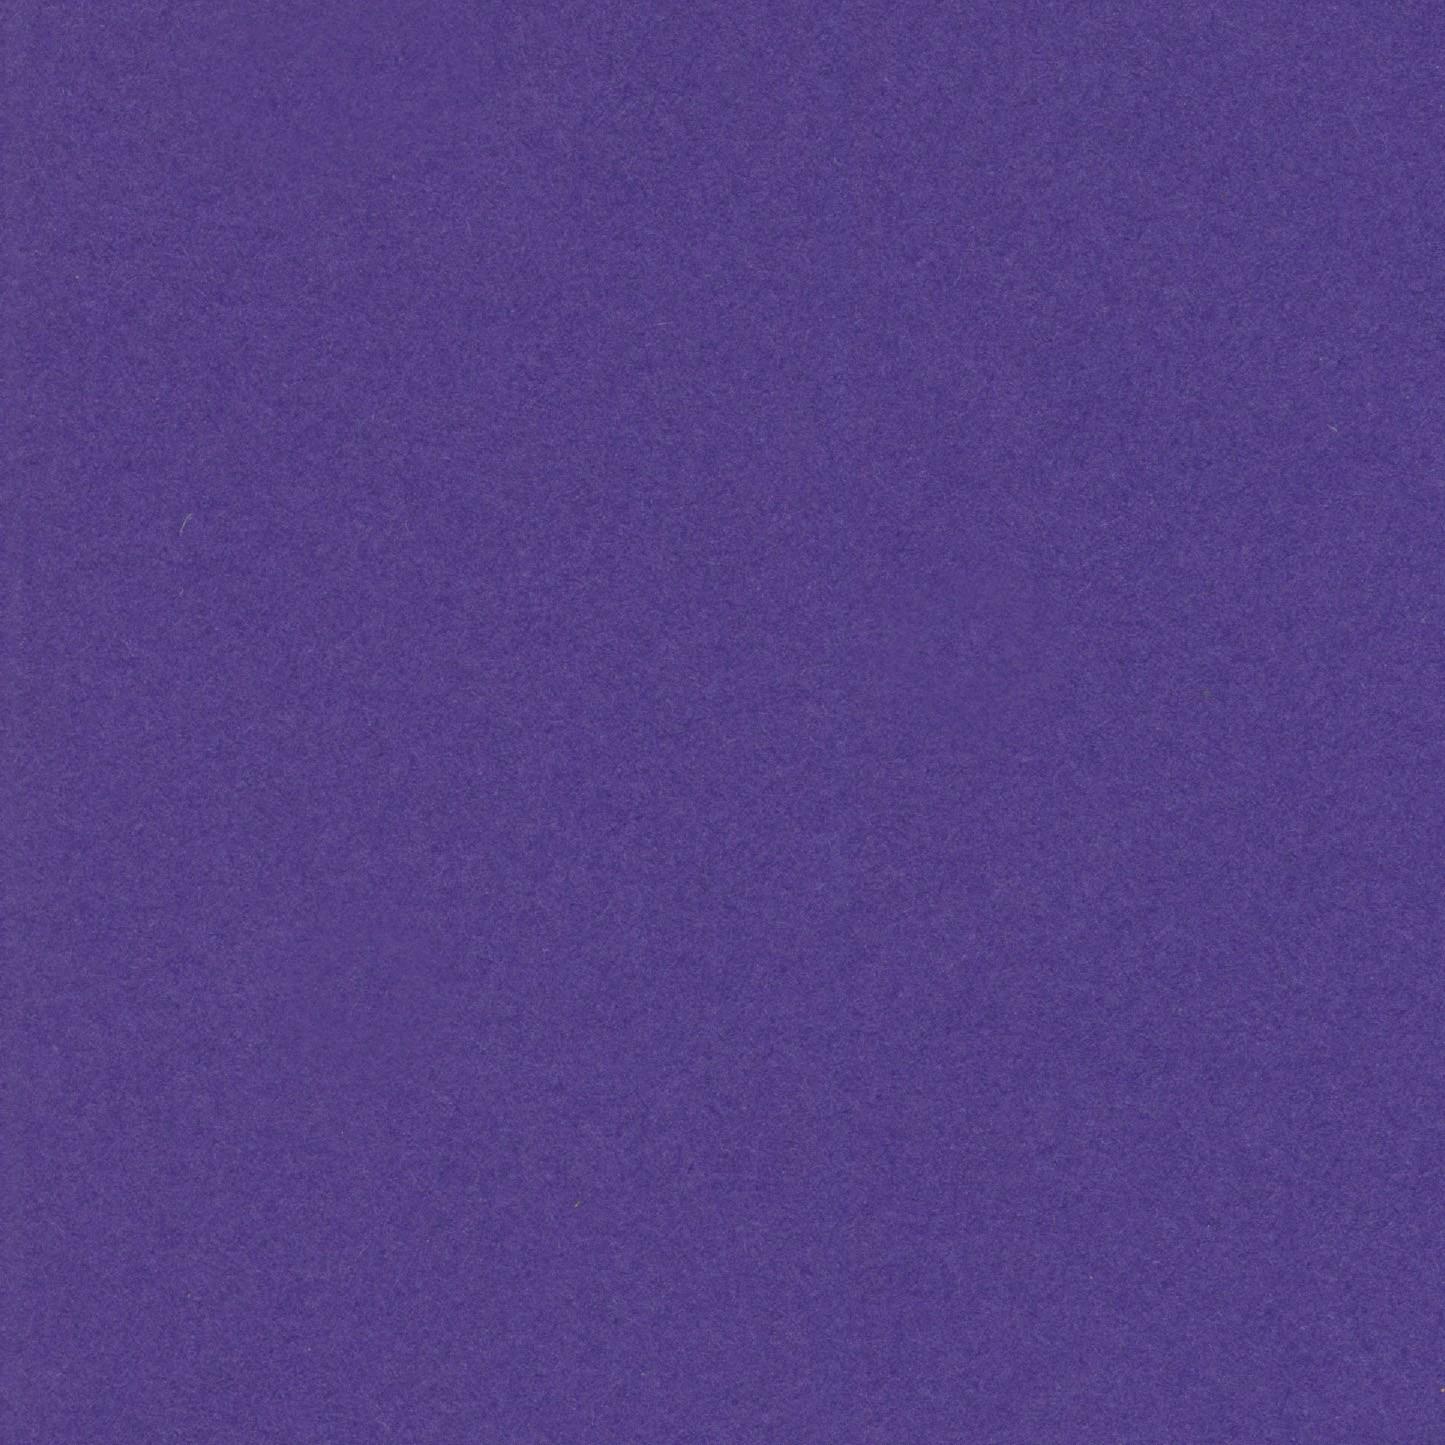 Purple - Deep 135gsm